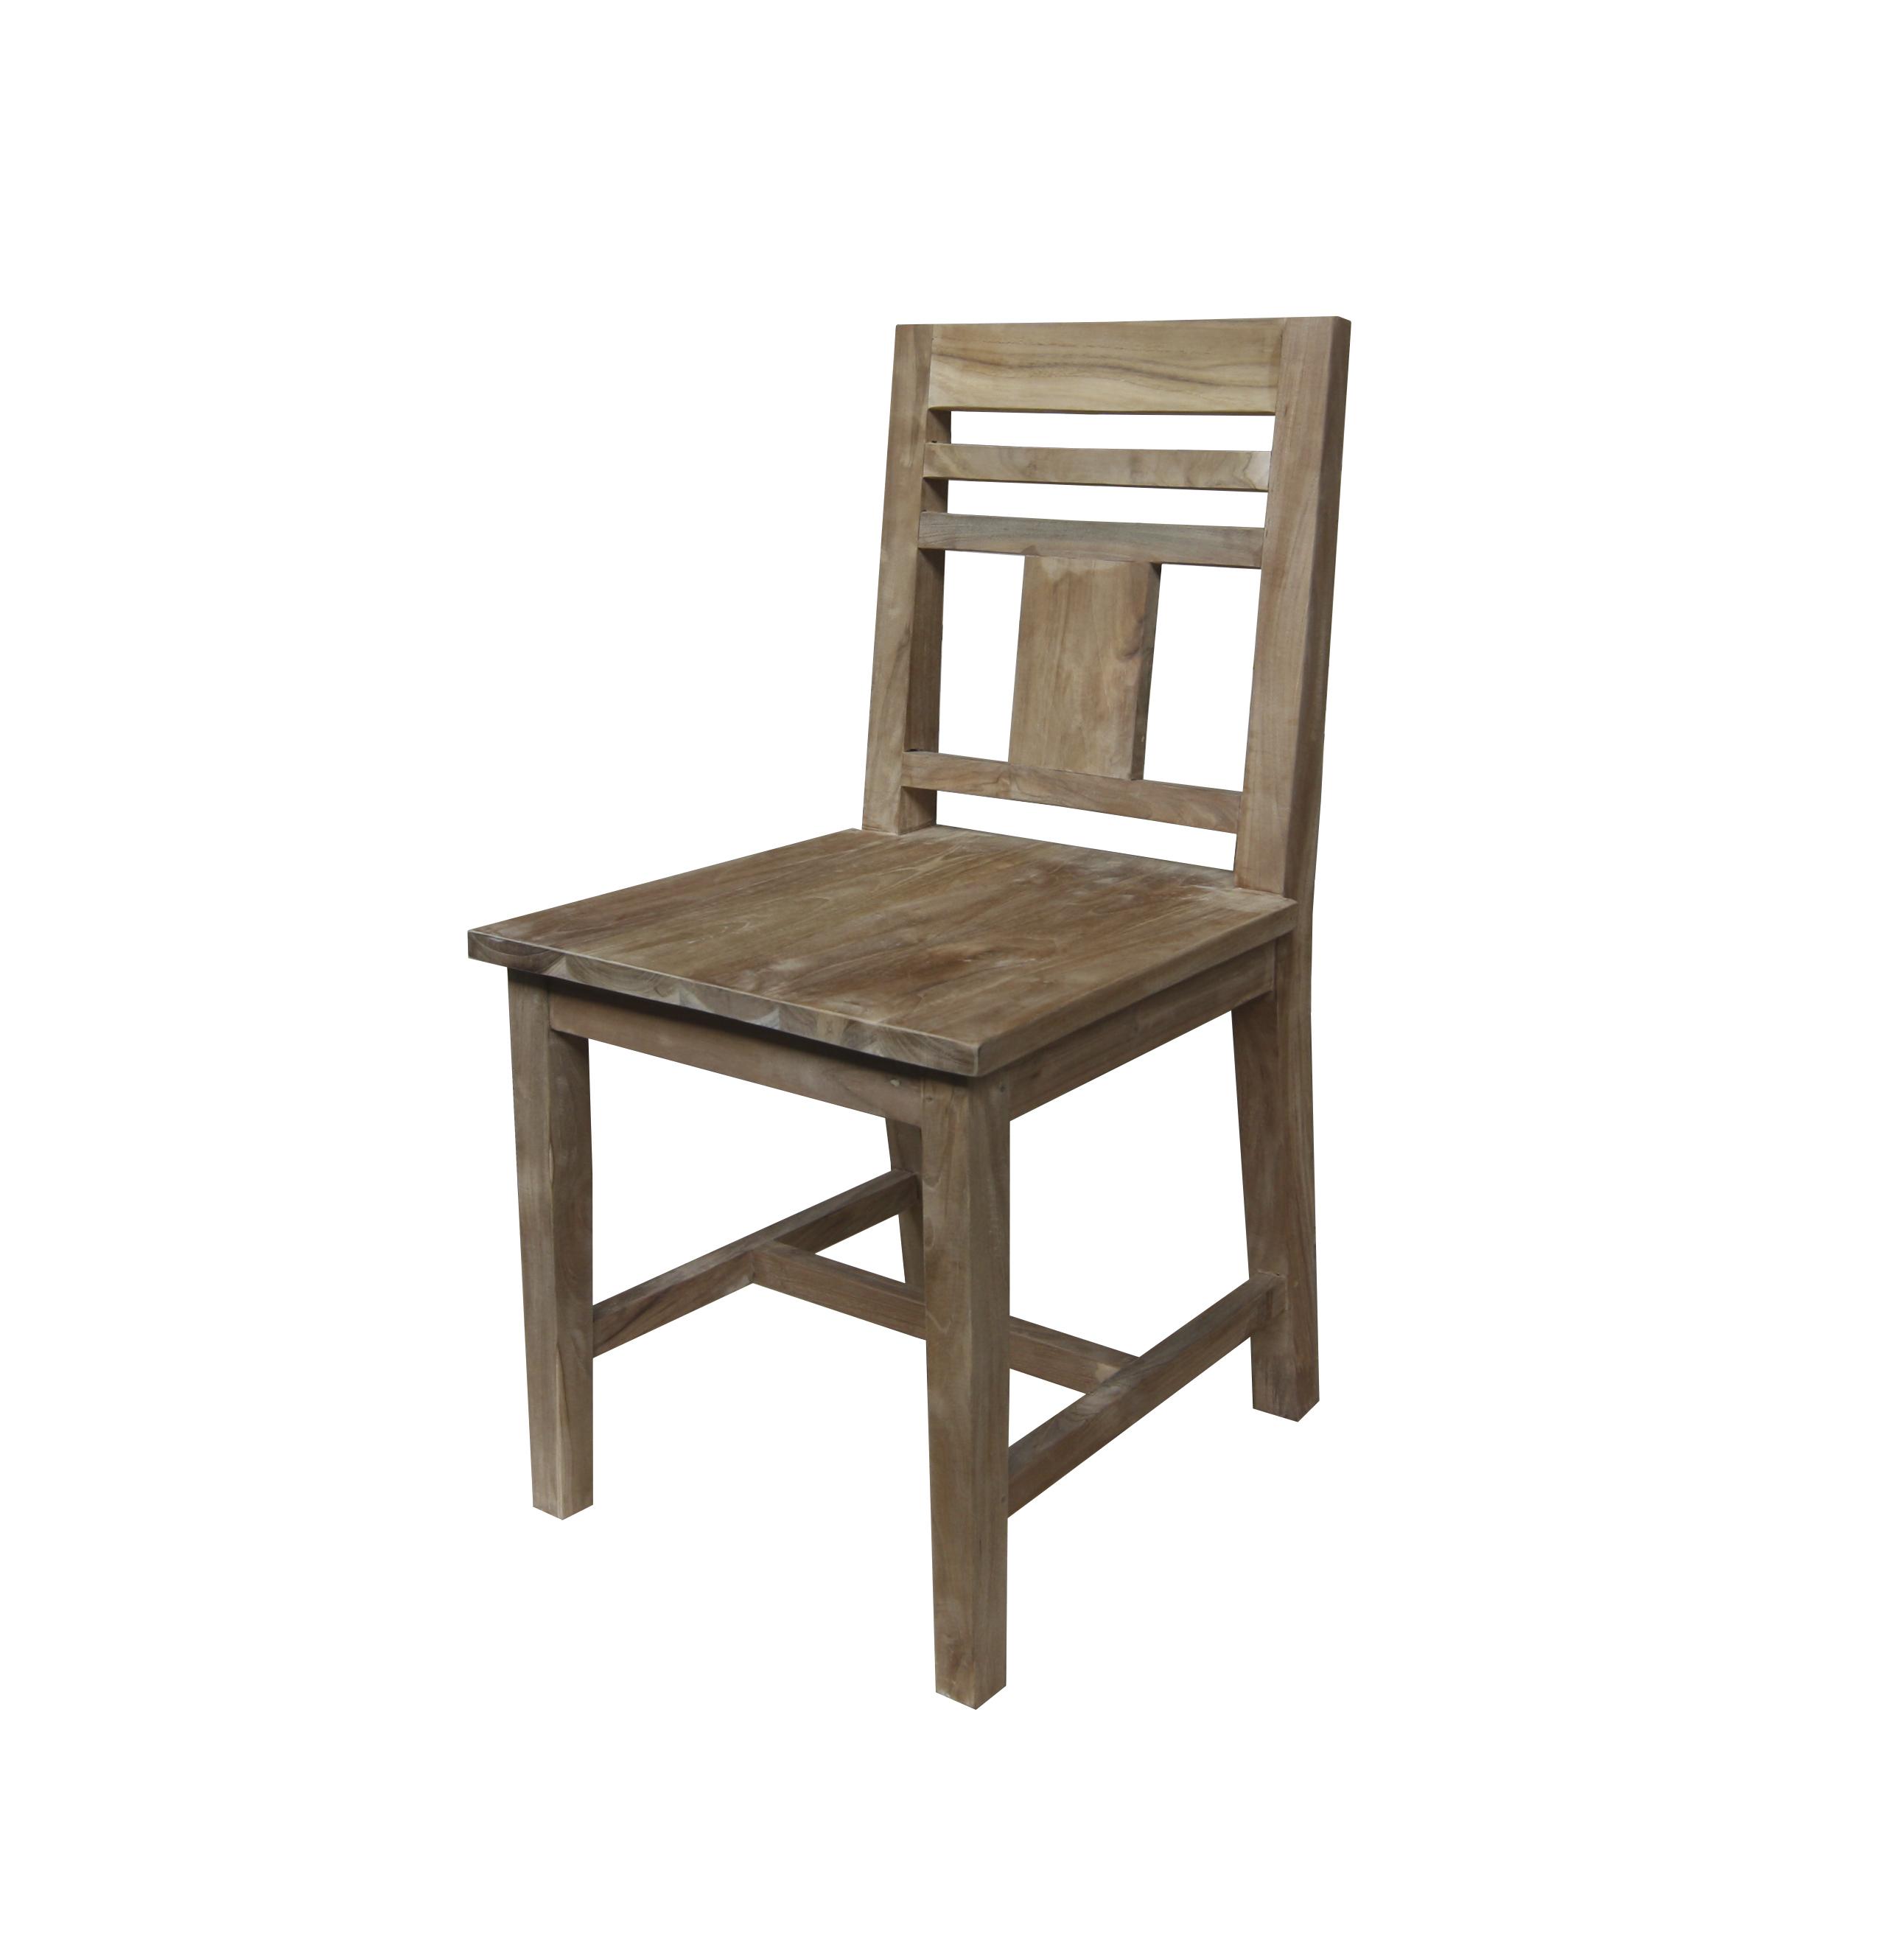 Medas reclaimed chair